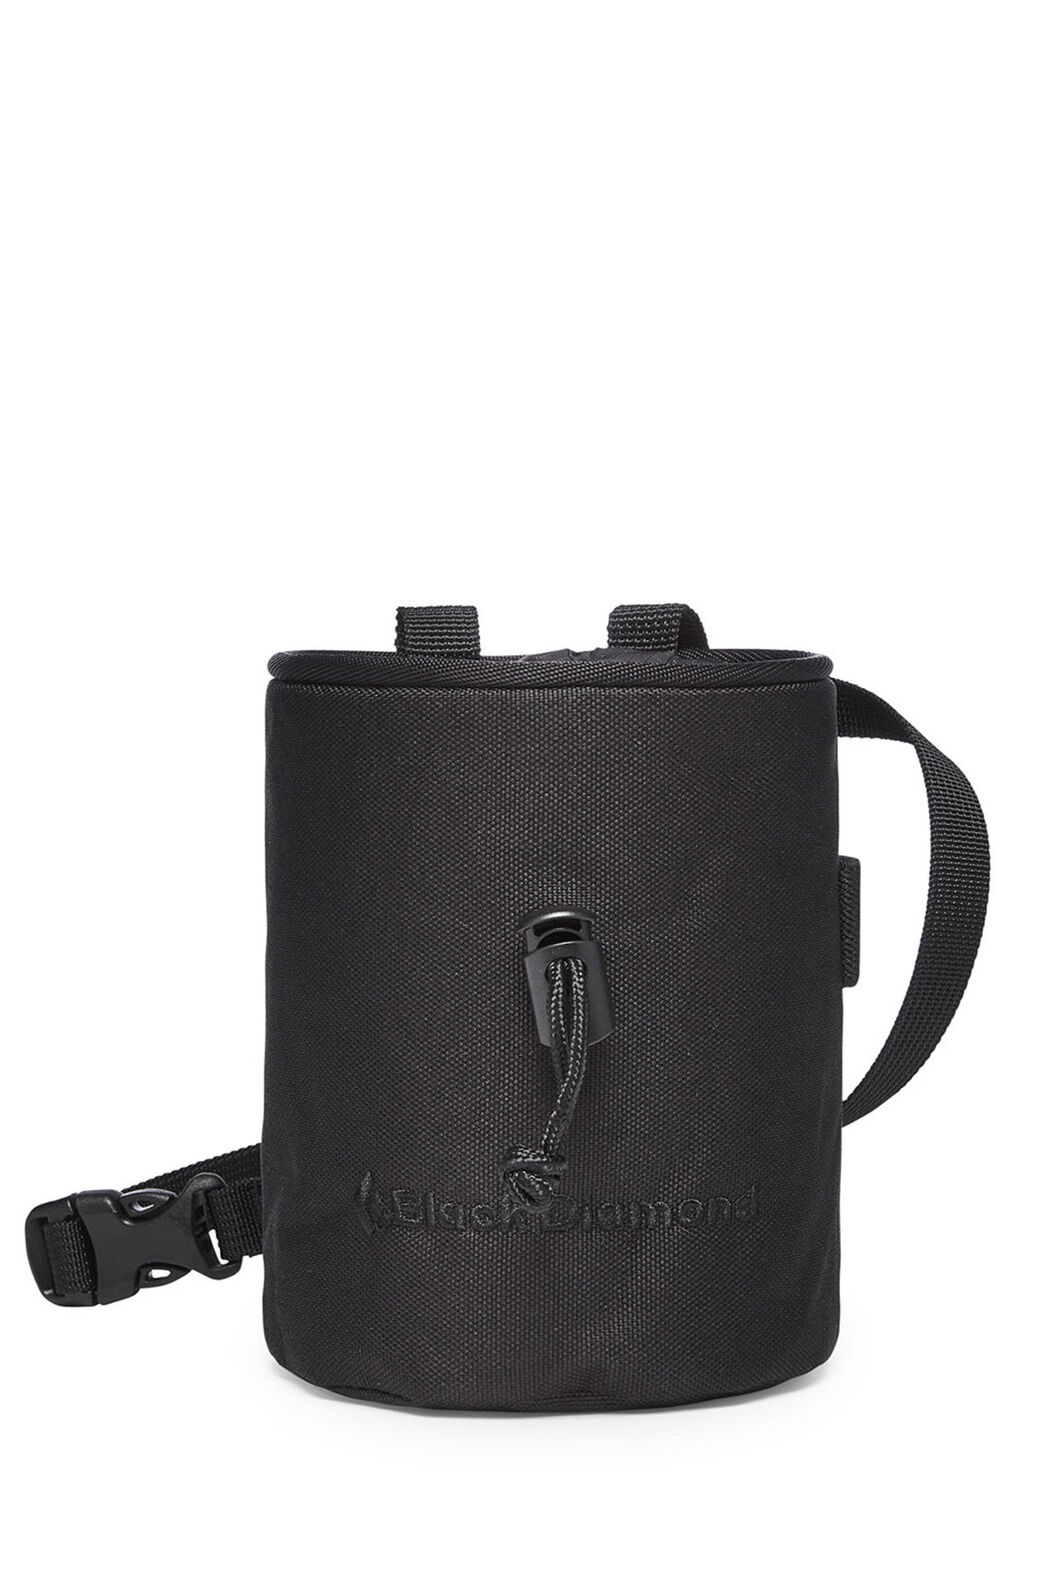 Black Diamond Mojo Chalk Bag, Black, hi-res